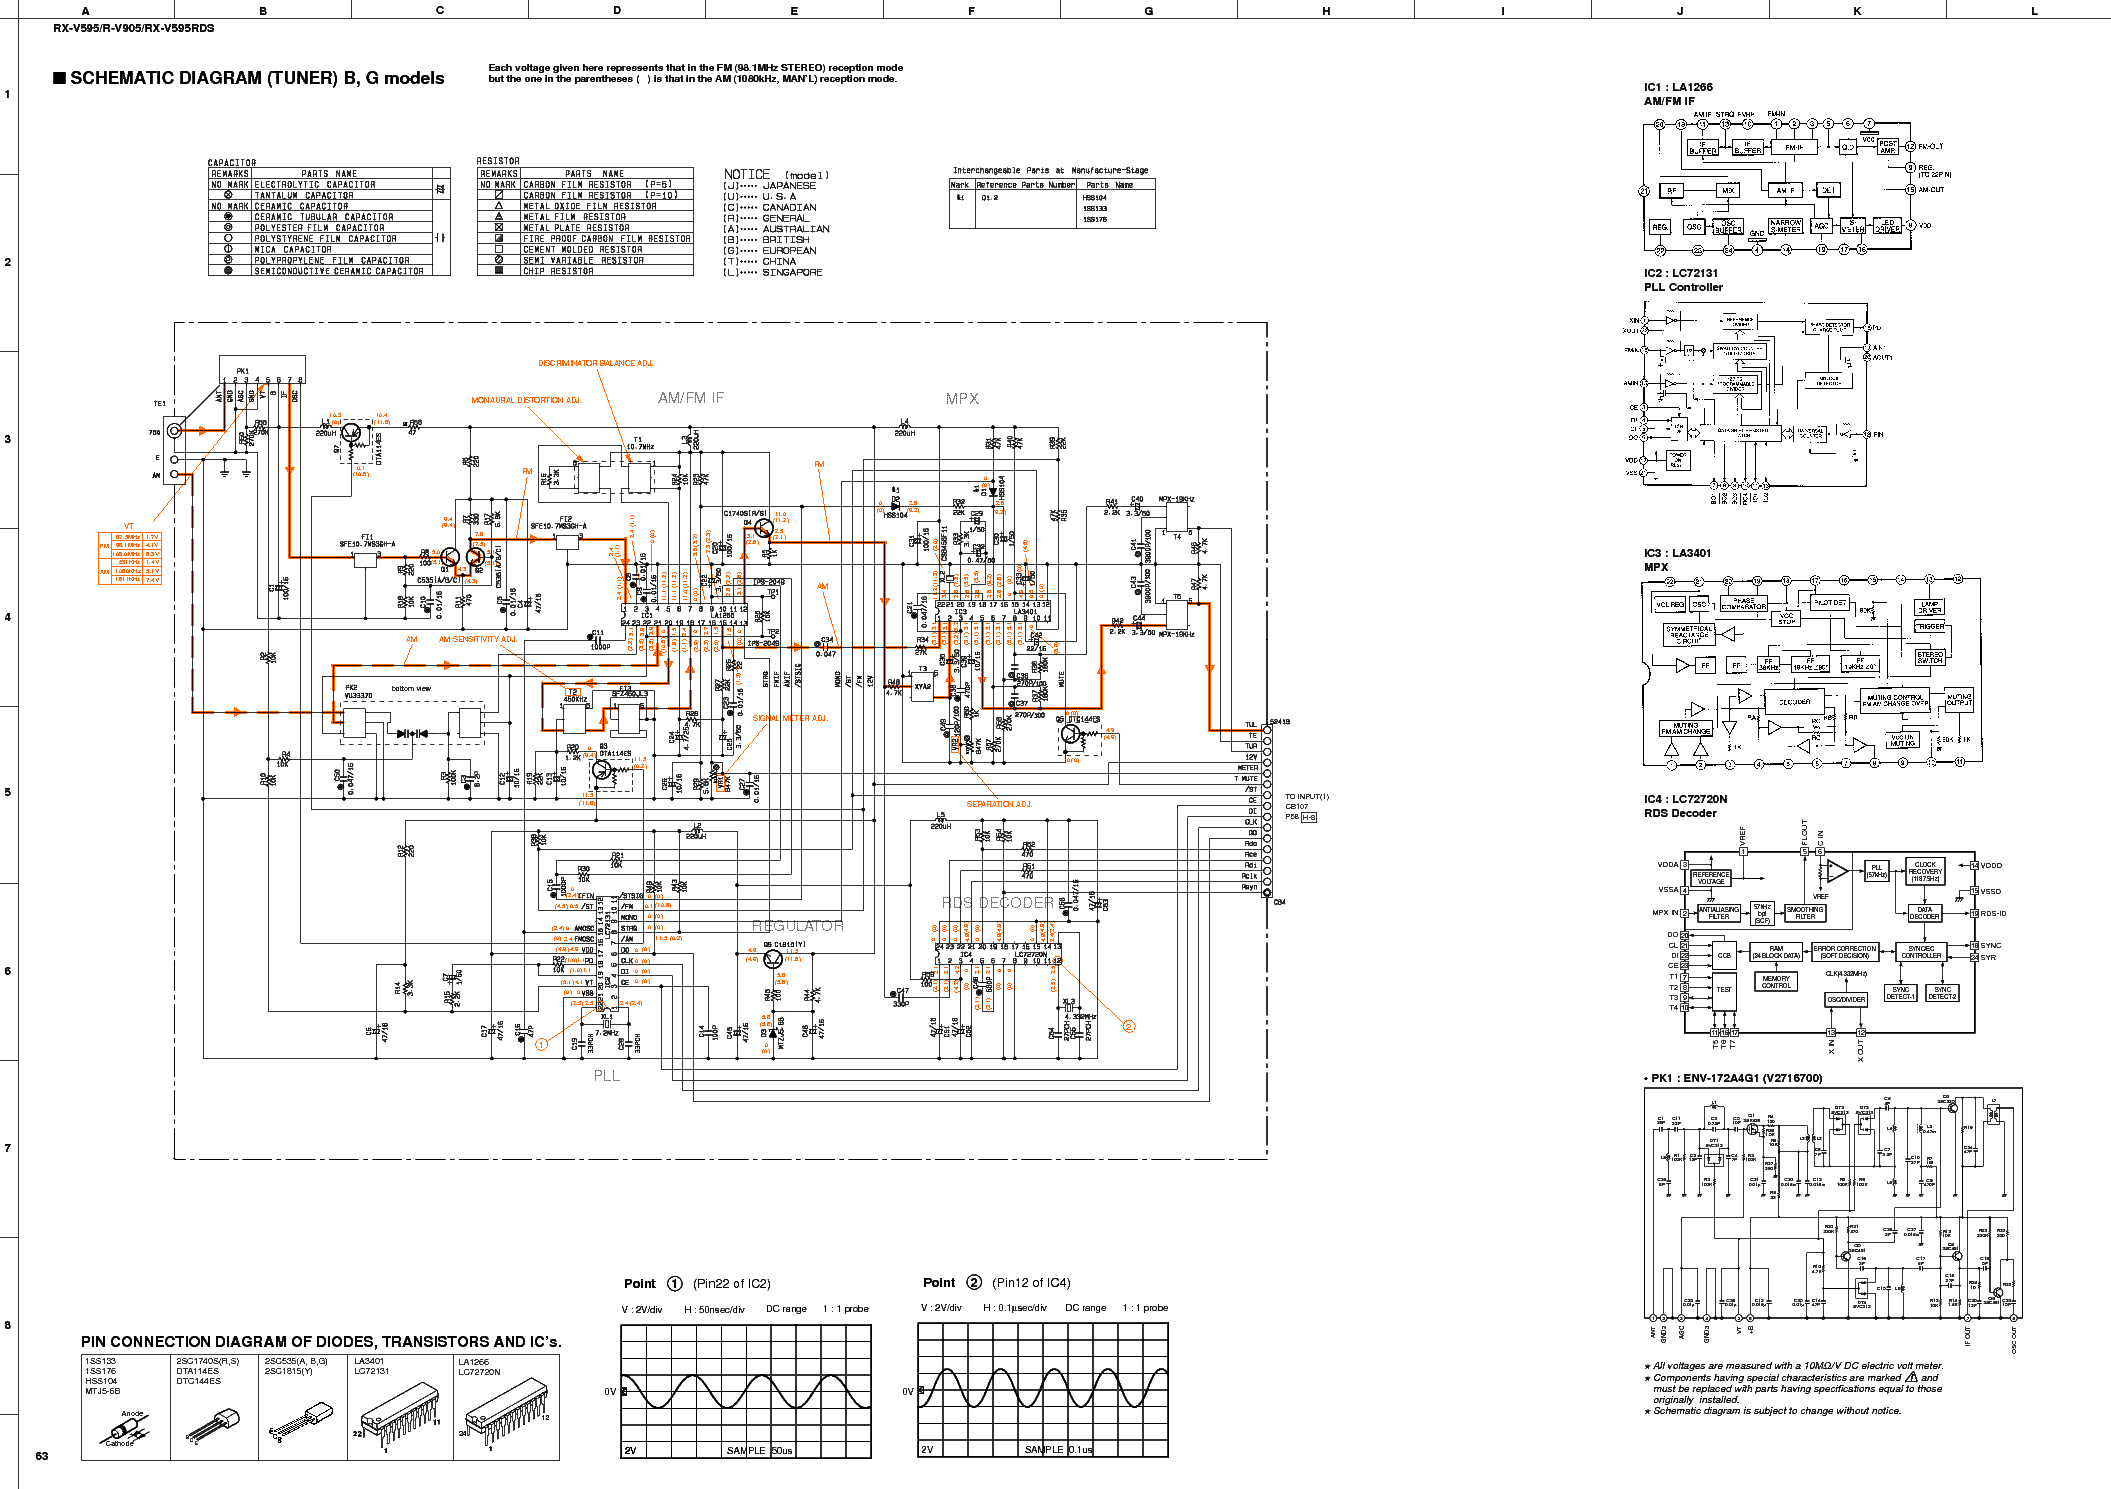 yamaha c 80 service manual download schematics eeprom repair info rh elektrotanya com yamaha rx-v595a service manual yamaha rx-v595a manual